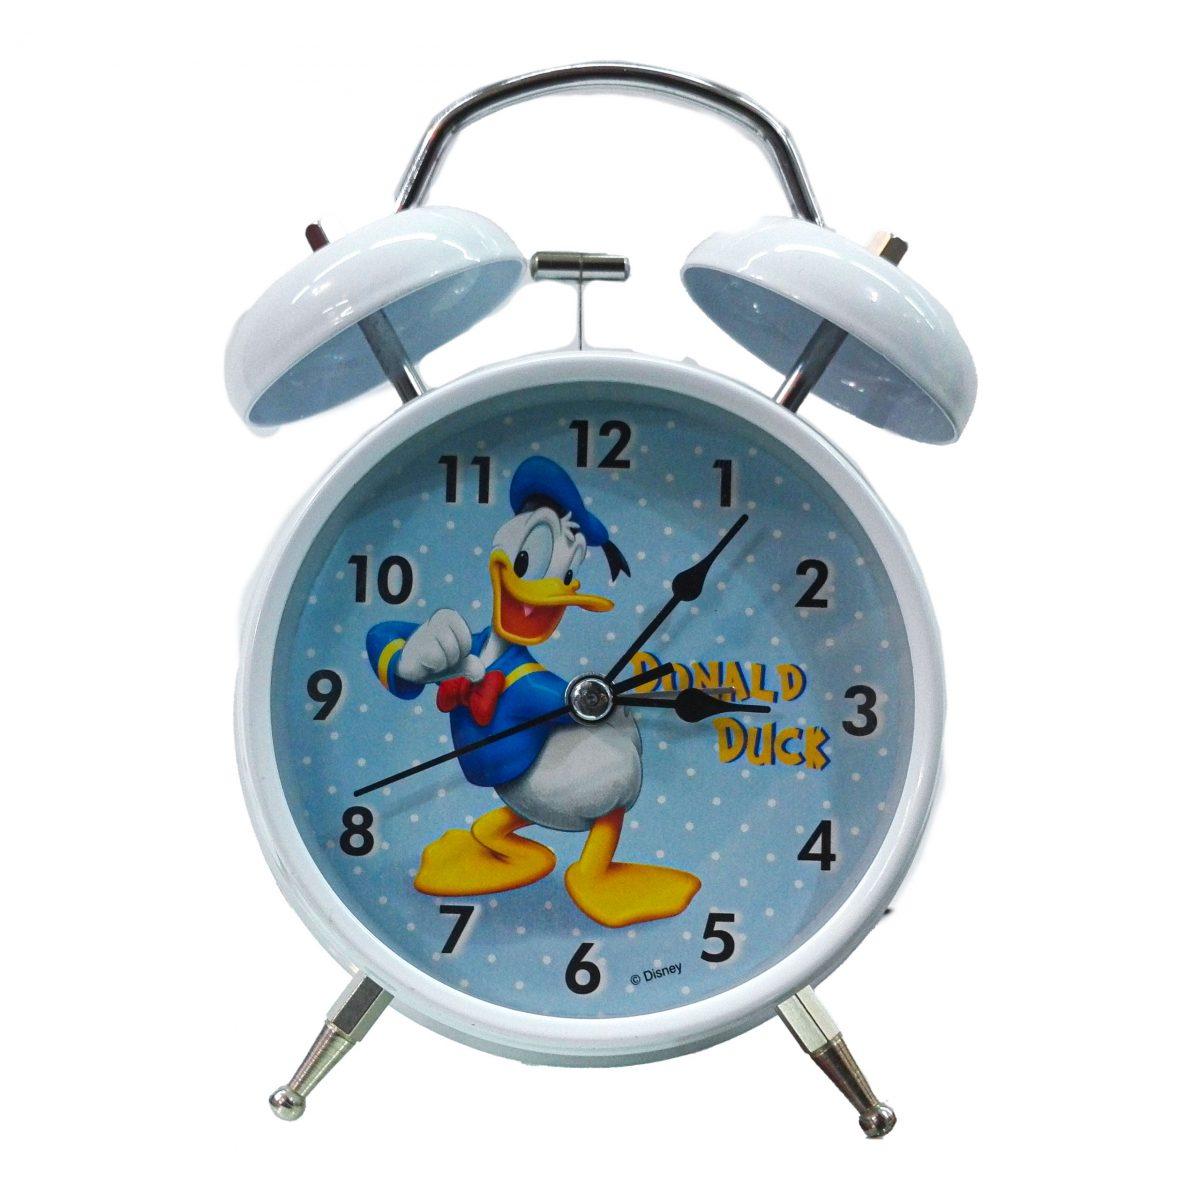 ساعت شخصیتی شماته دار اردک